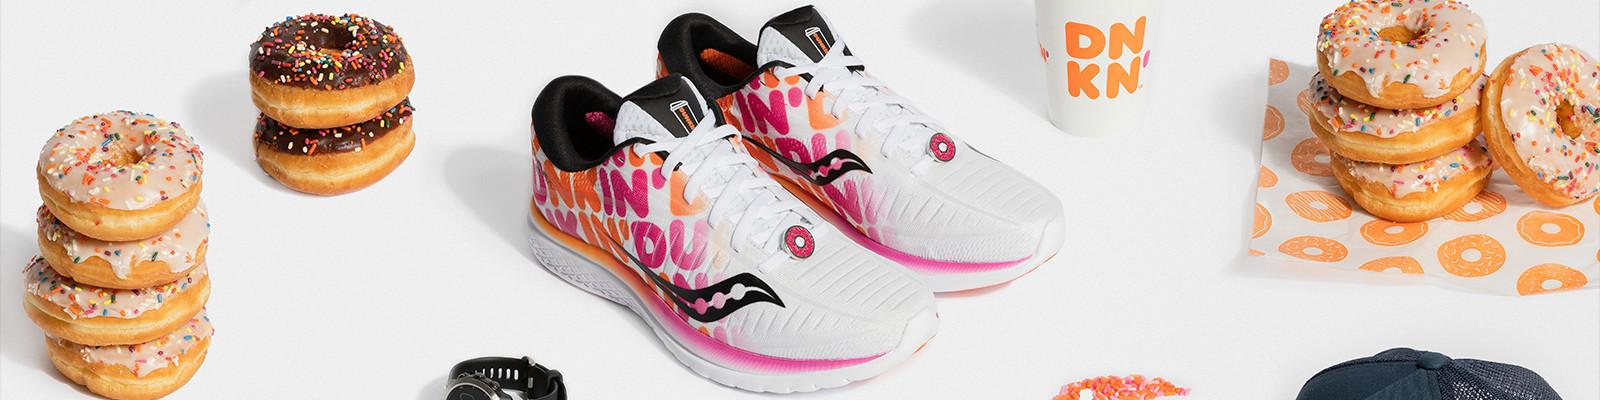 Dunkin' Donuts联名「甜甜圈跑鞋」 三色鞋带+草莓糖霜徽章,穿上?#27599;?#21475;